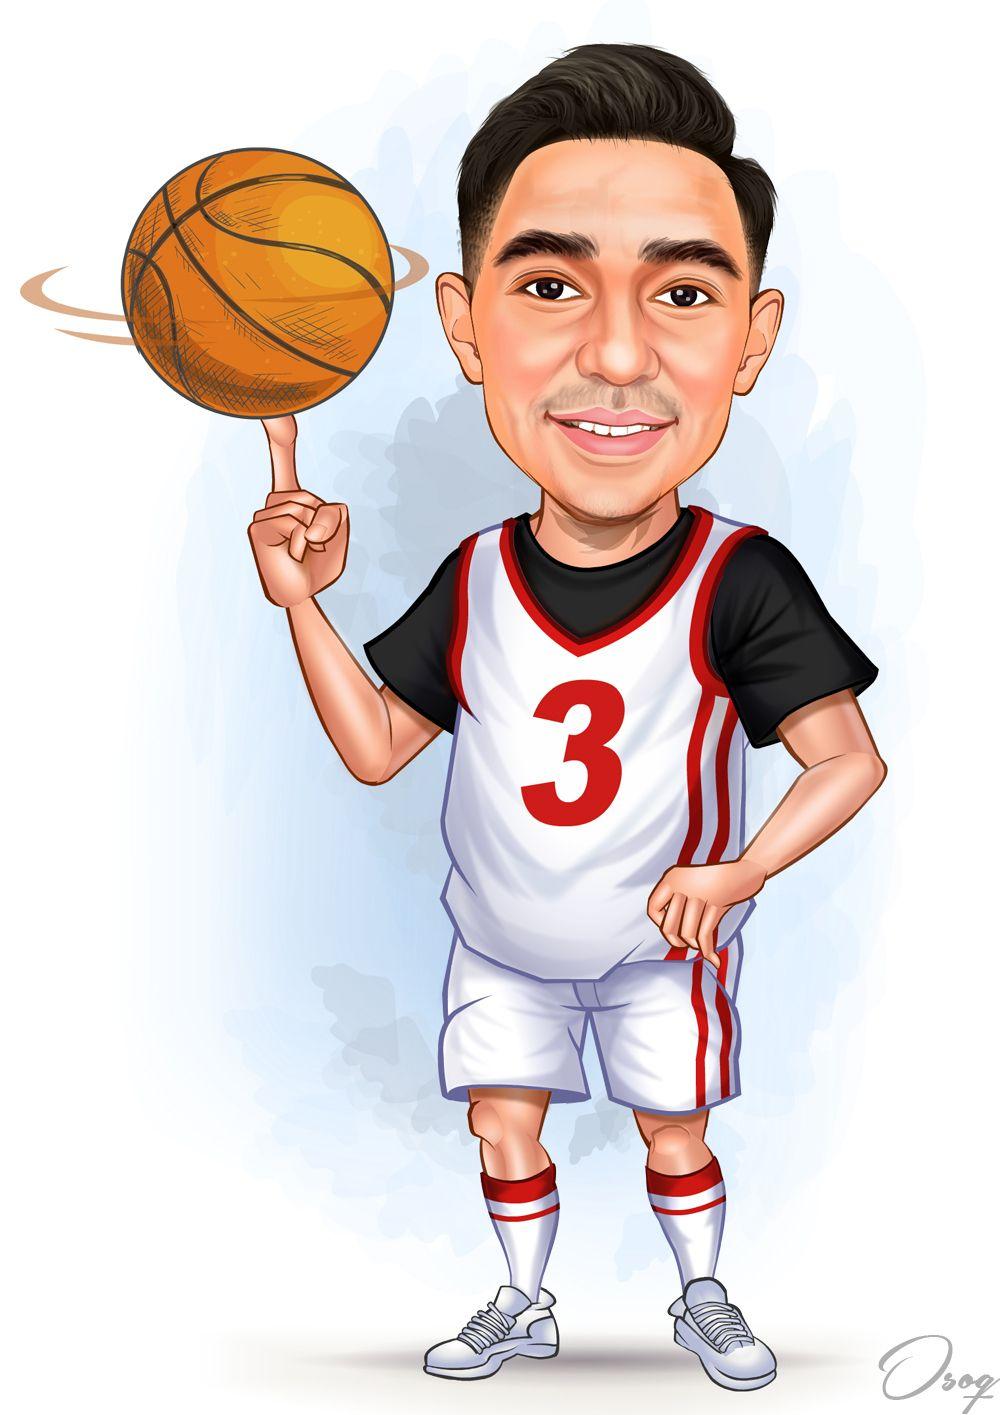 Basketball Cartoon Cartoon Man Basketball Players Basketball Bedroom Girls